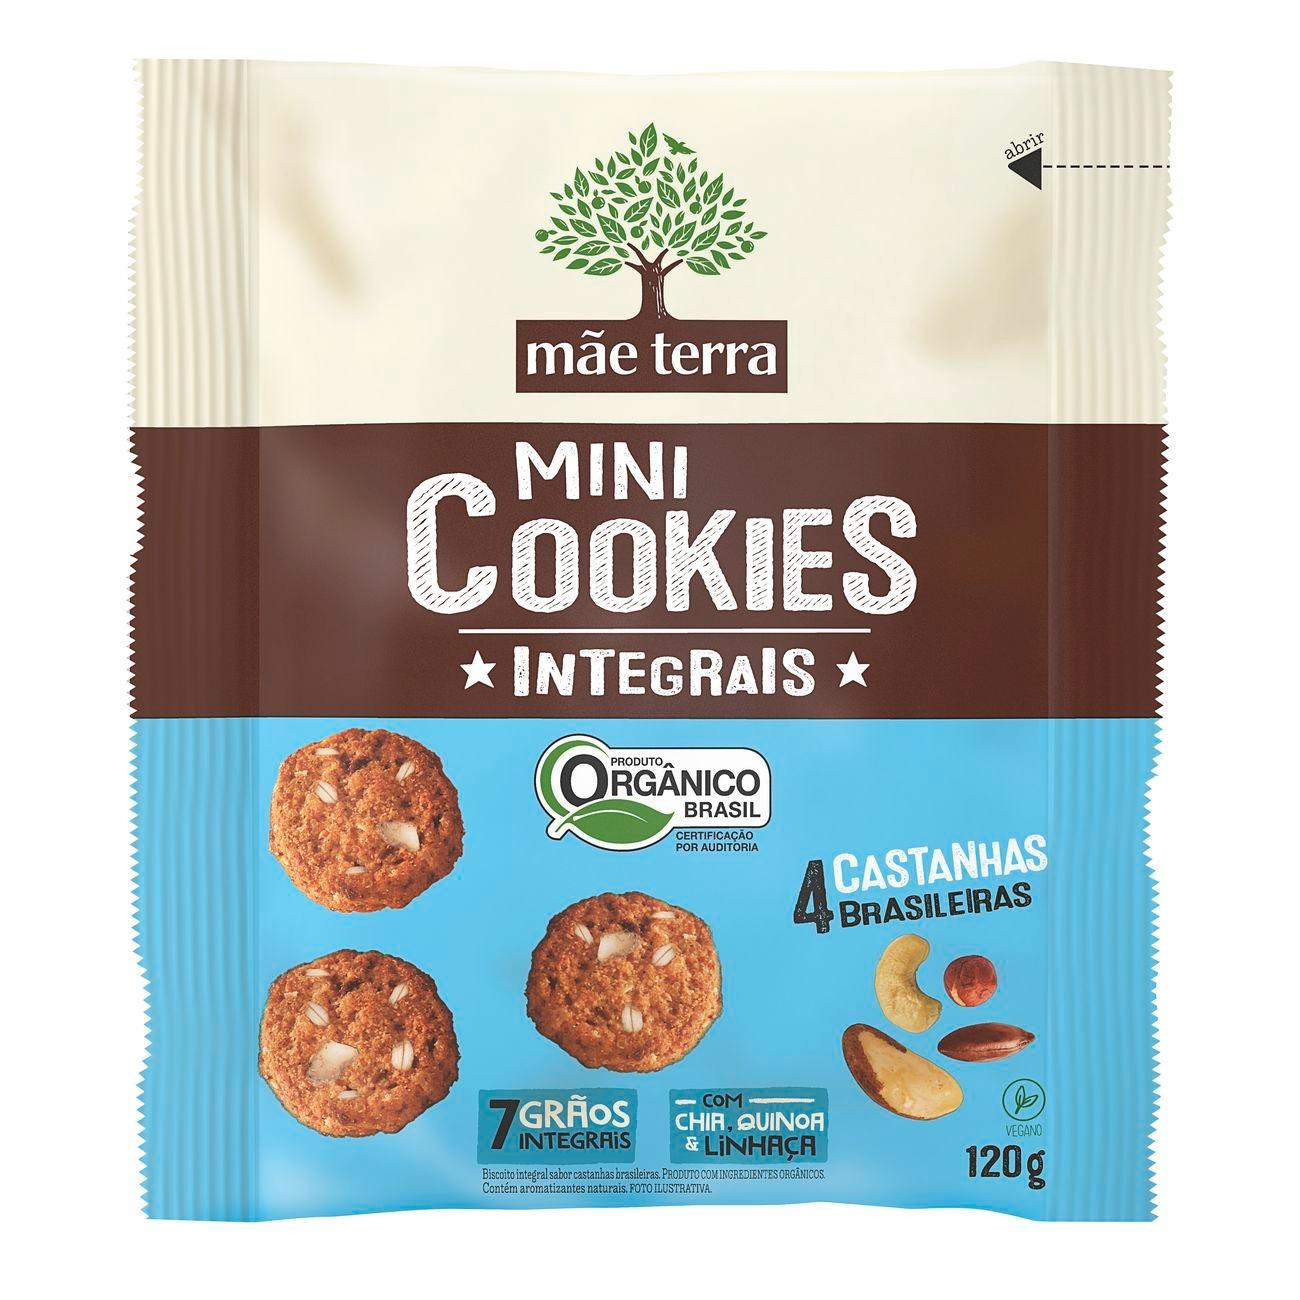 Cookie Integral Orgânico Mãe Terra 4 Castanhas Brasileiras 120g